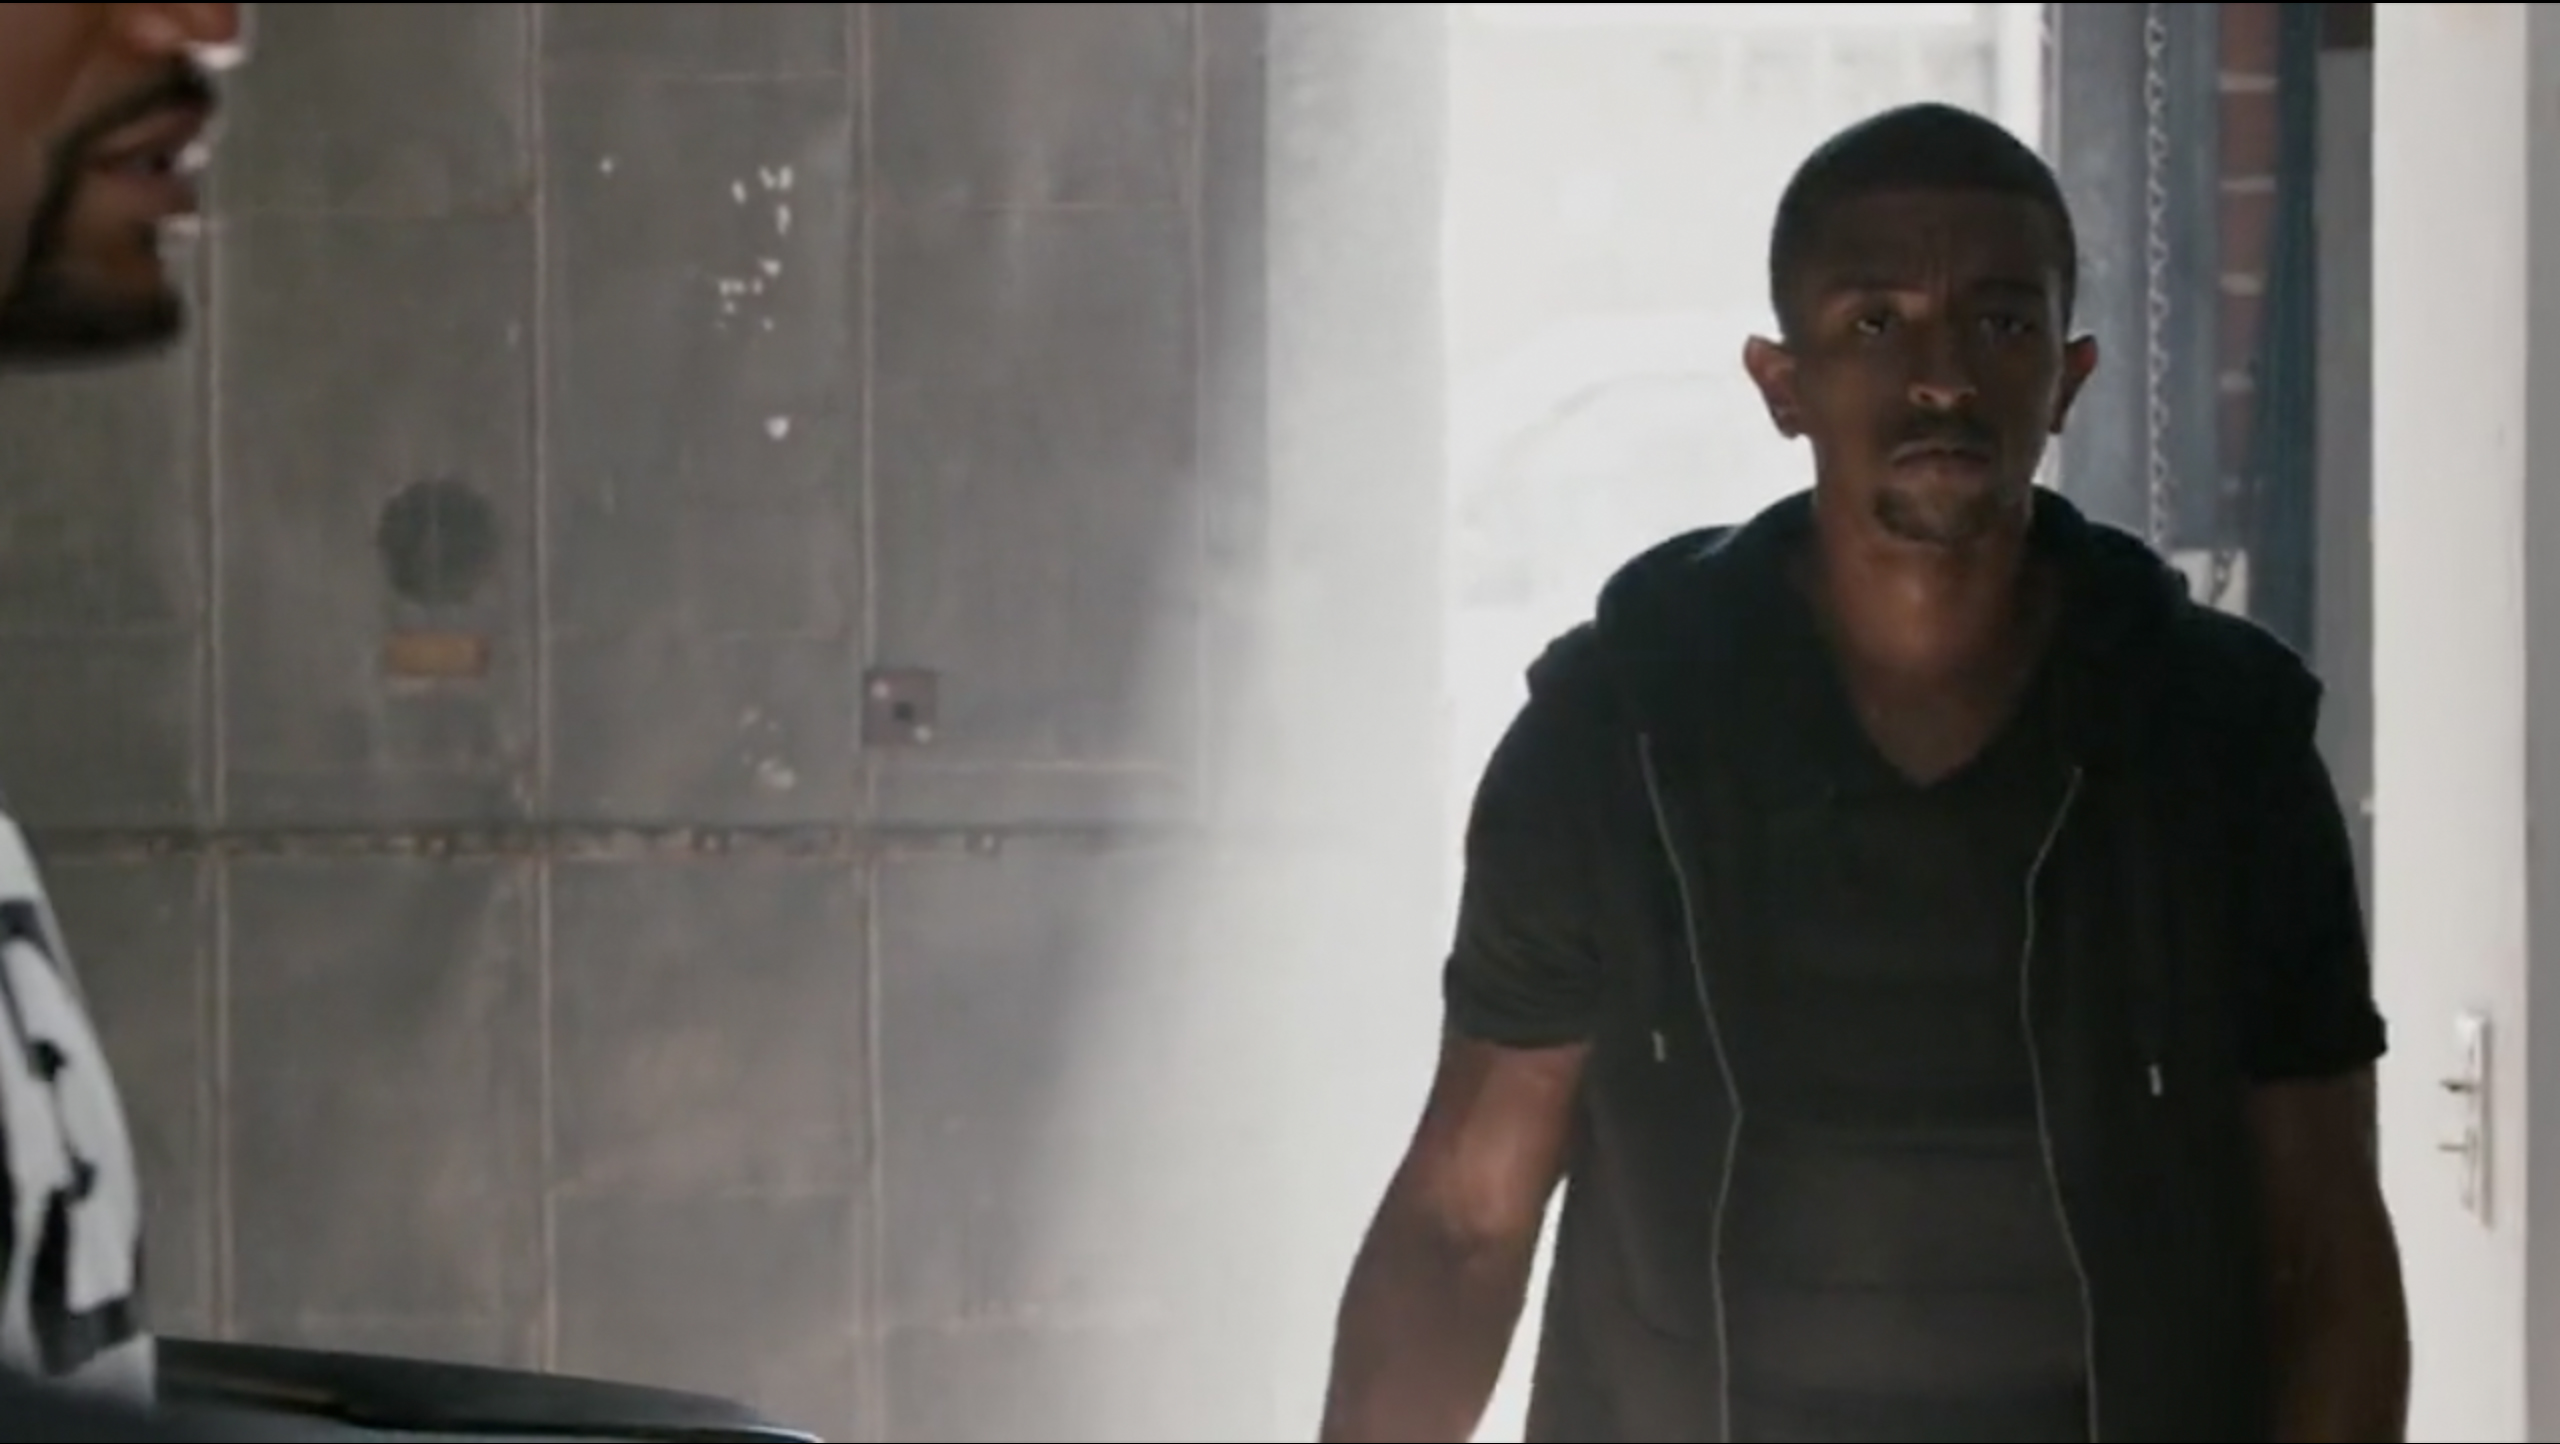 Kevin L. Walker/Rampage Jackson in Vigilante Diaries